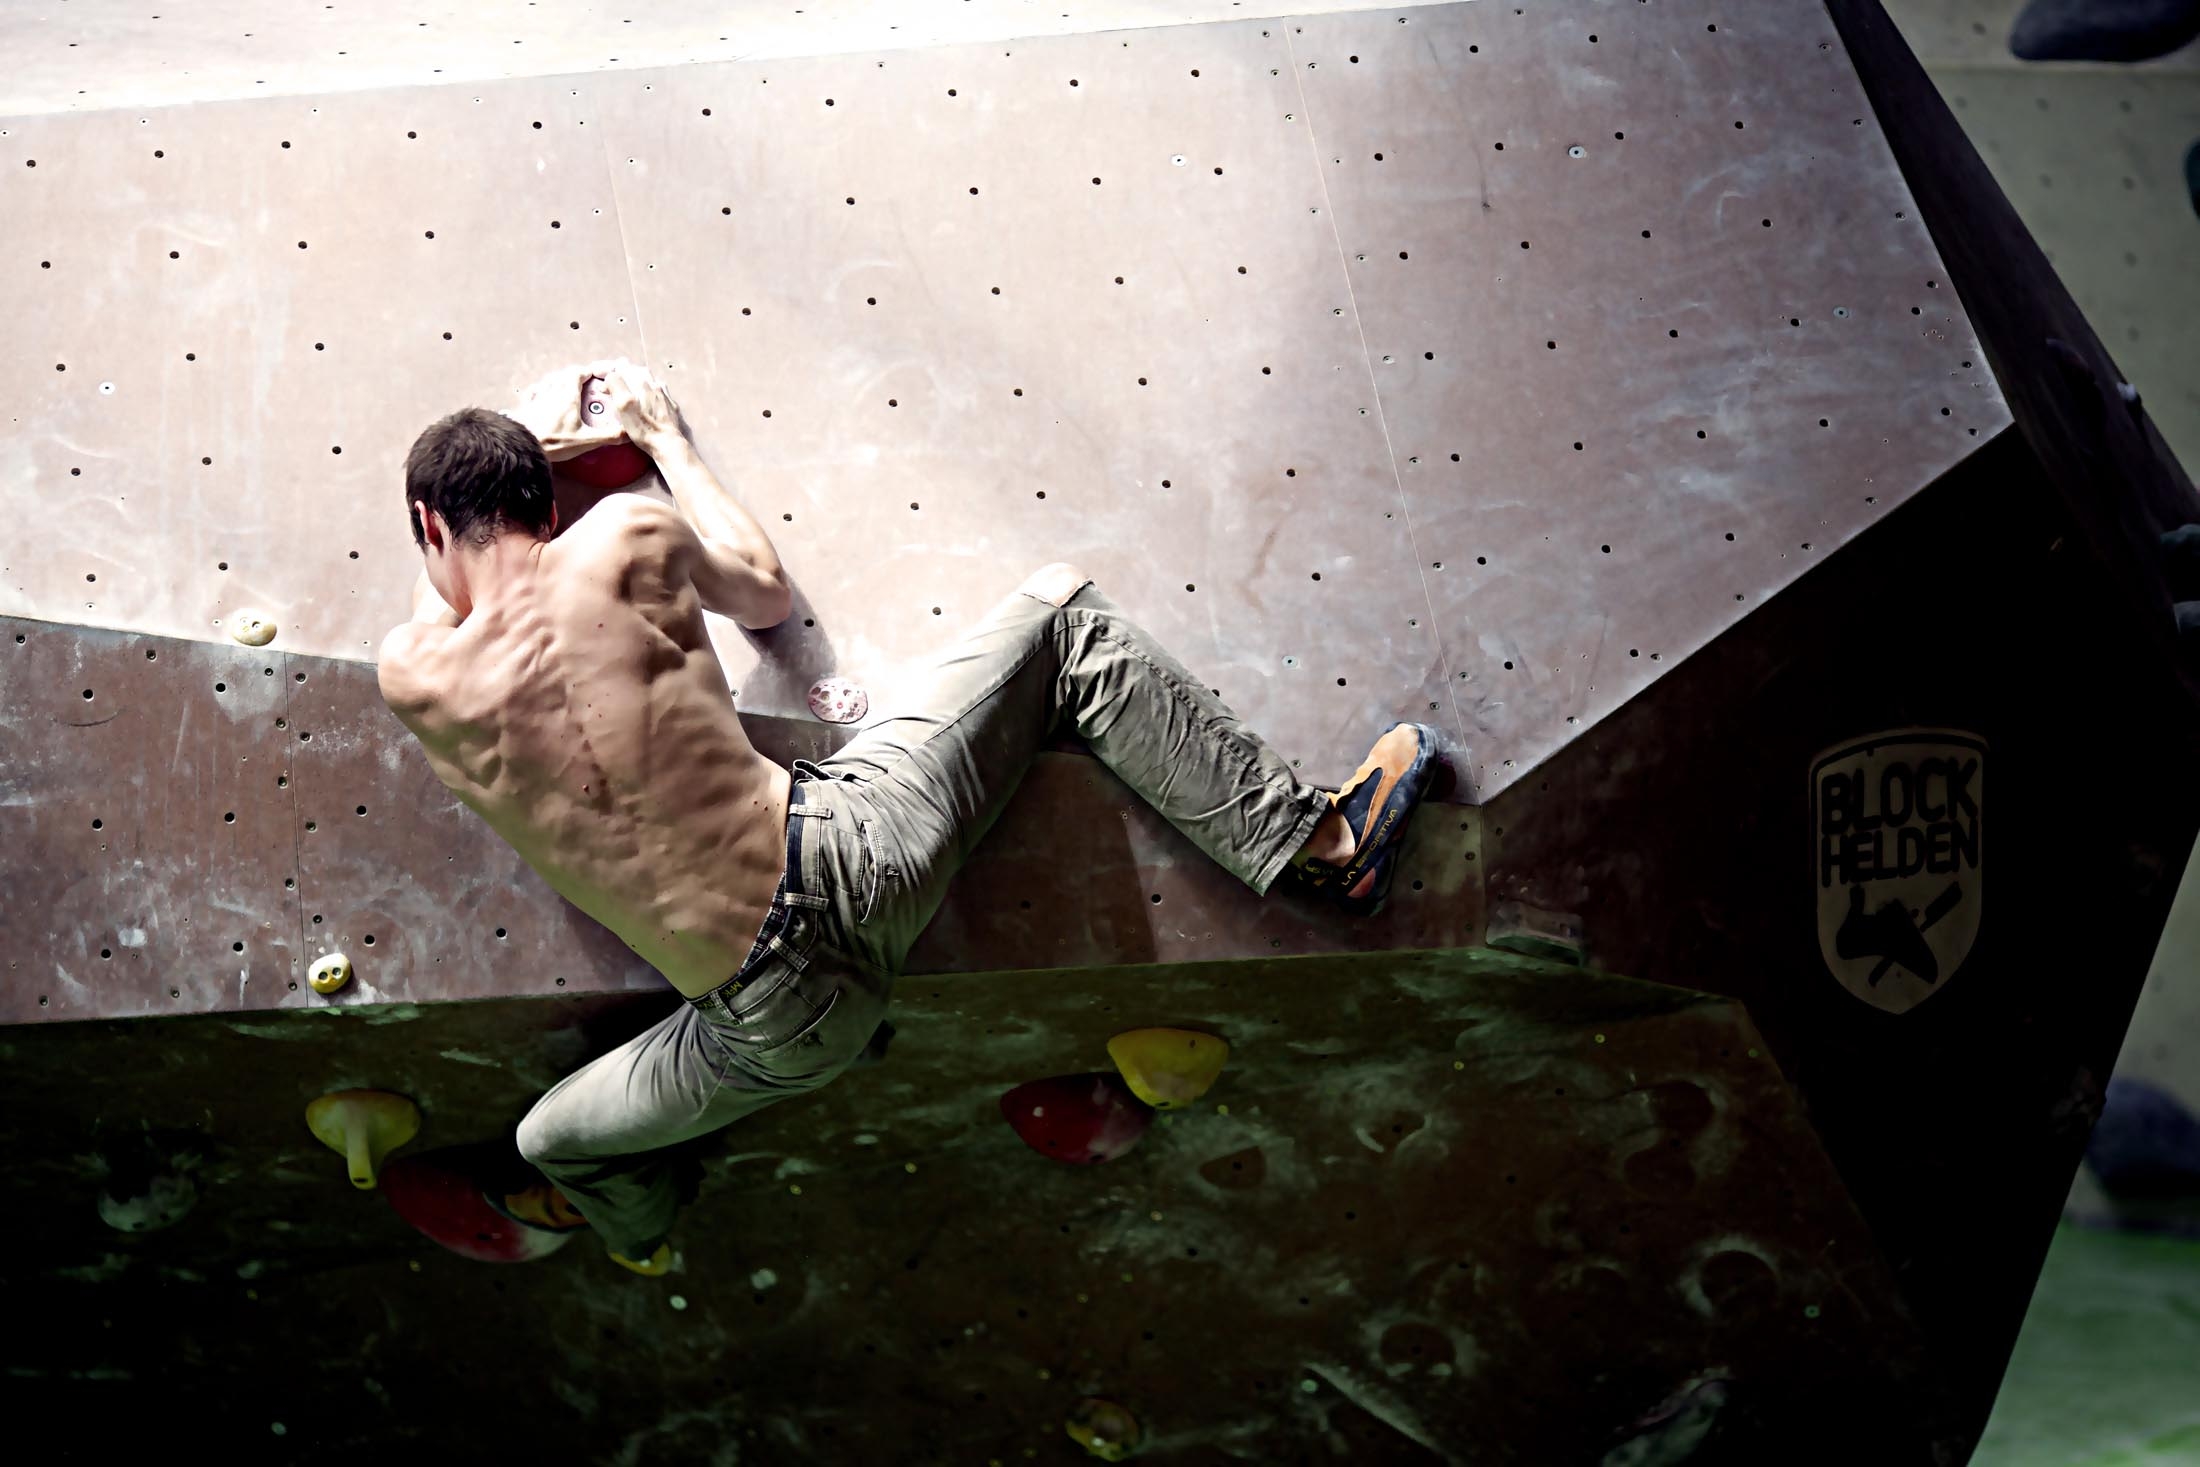 Quali, internationaler bouldercup Frankenjura 2016, BLOCKHELDEN Erlangen, Mammut, Bergfreunde.de, Boulderwettkampf07092016335